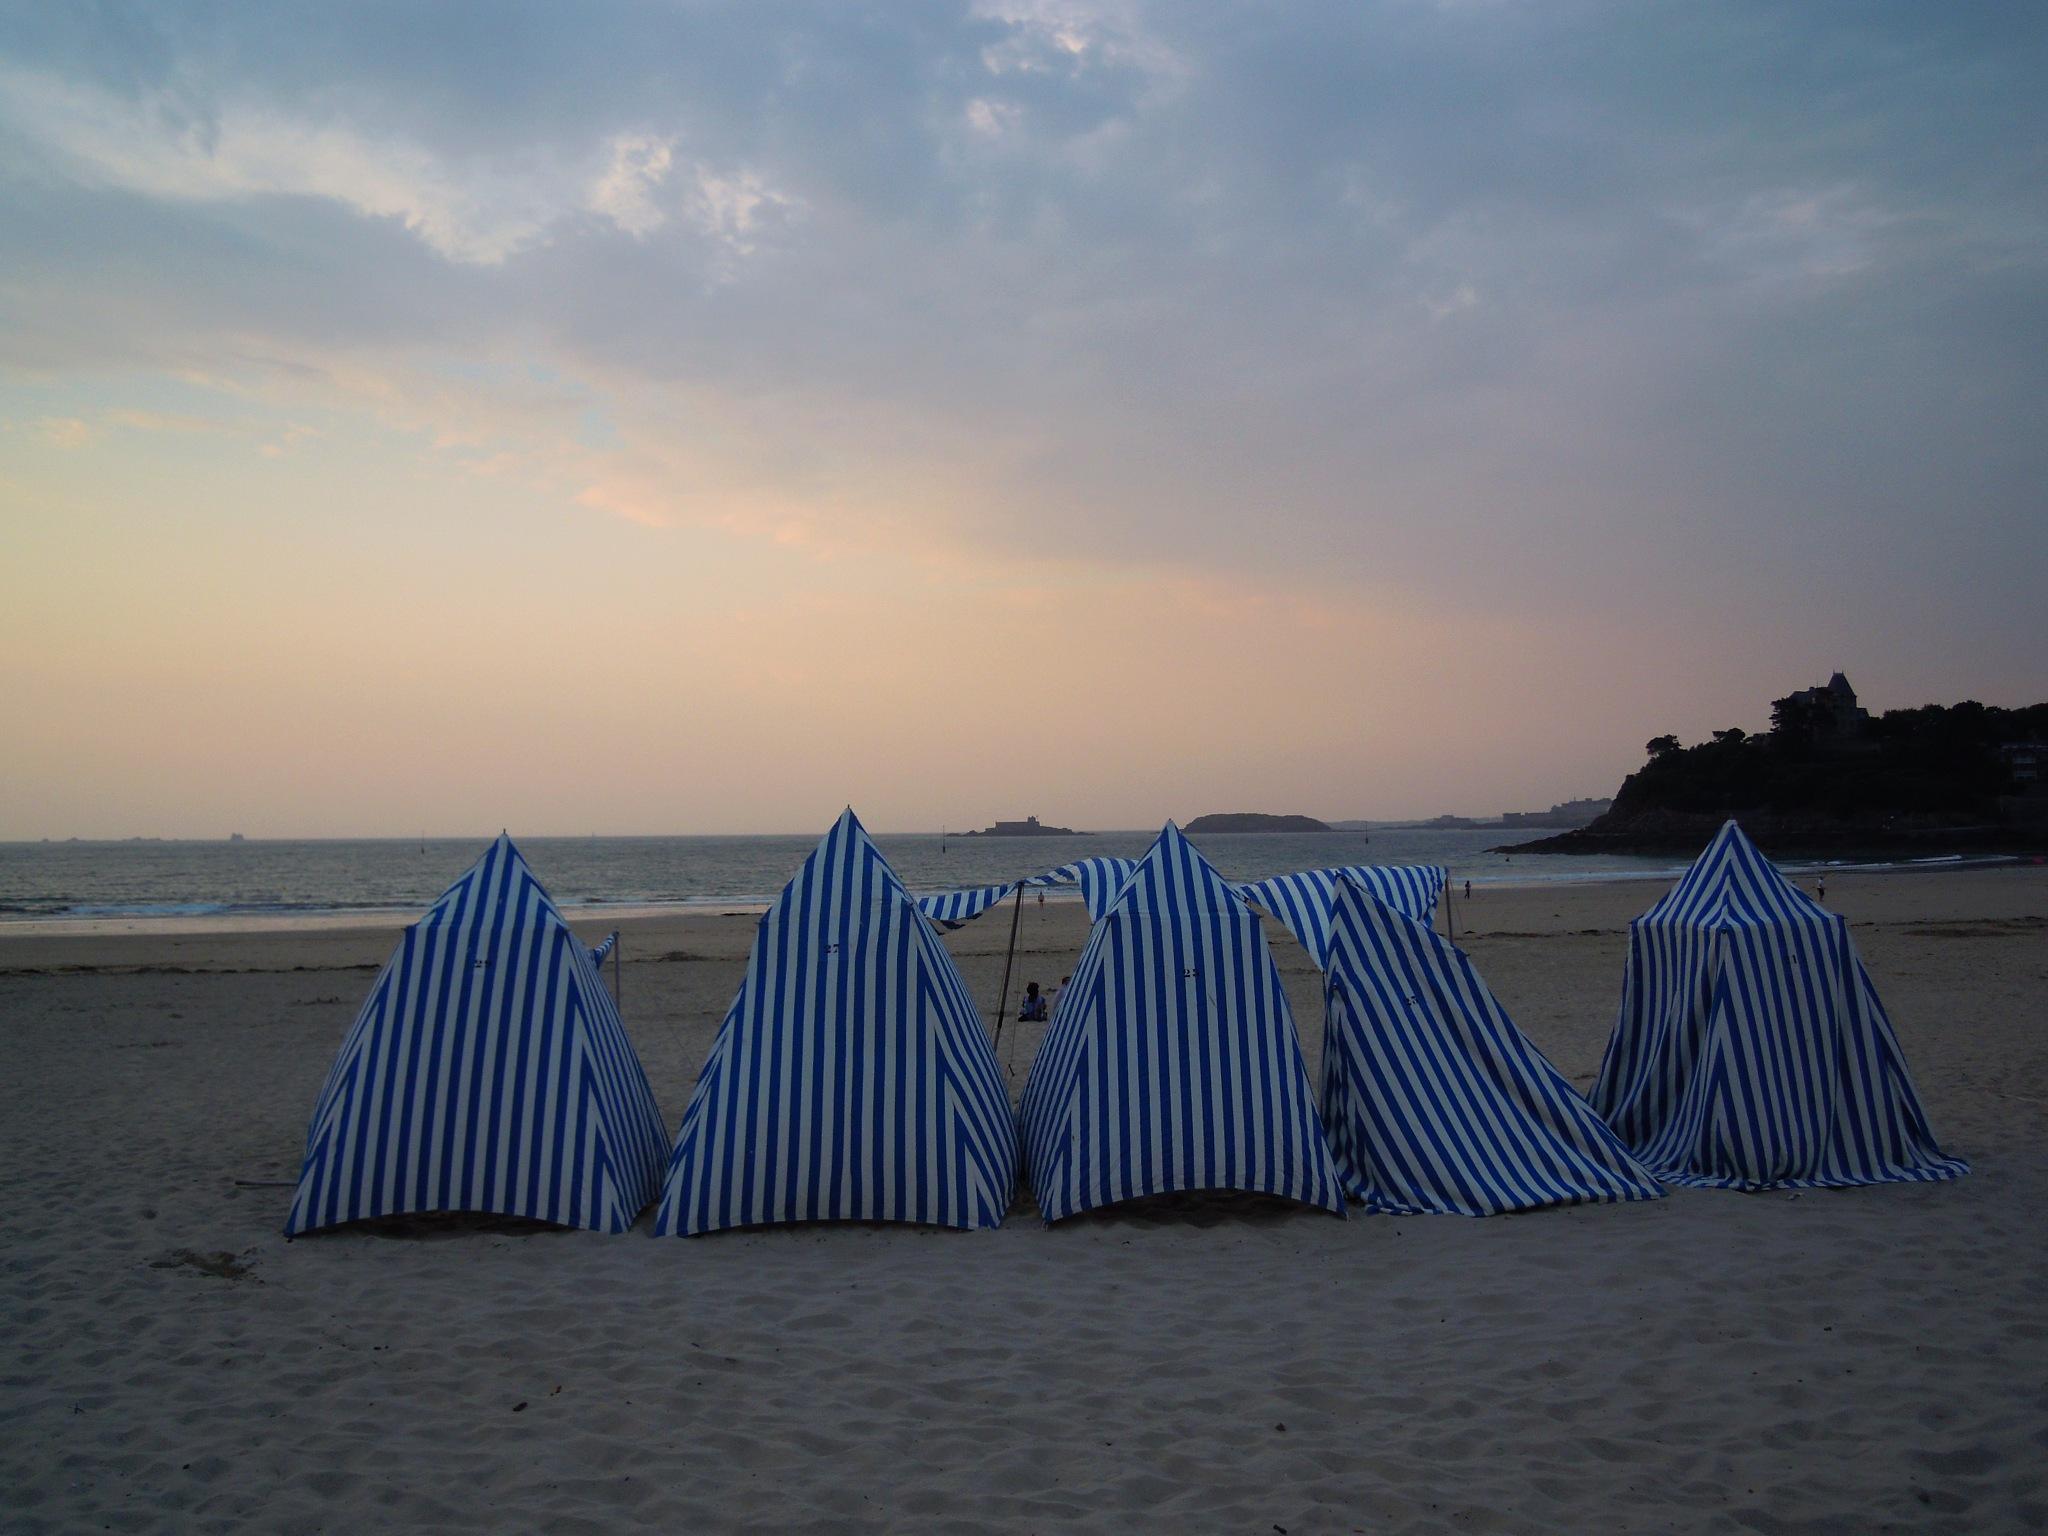 Beach tents at twilight - Dinard (Normandy) by Bice Portinari